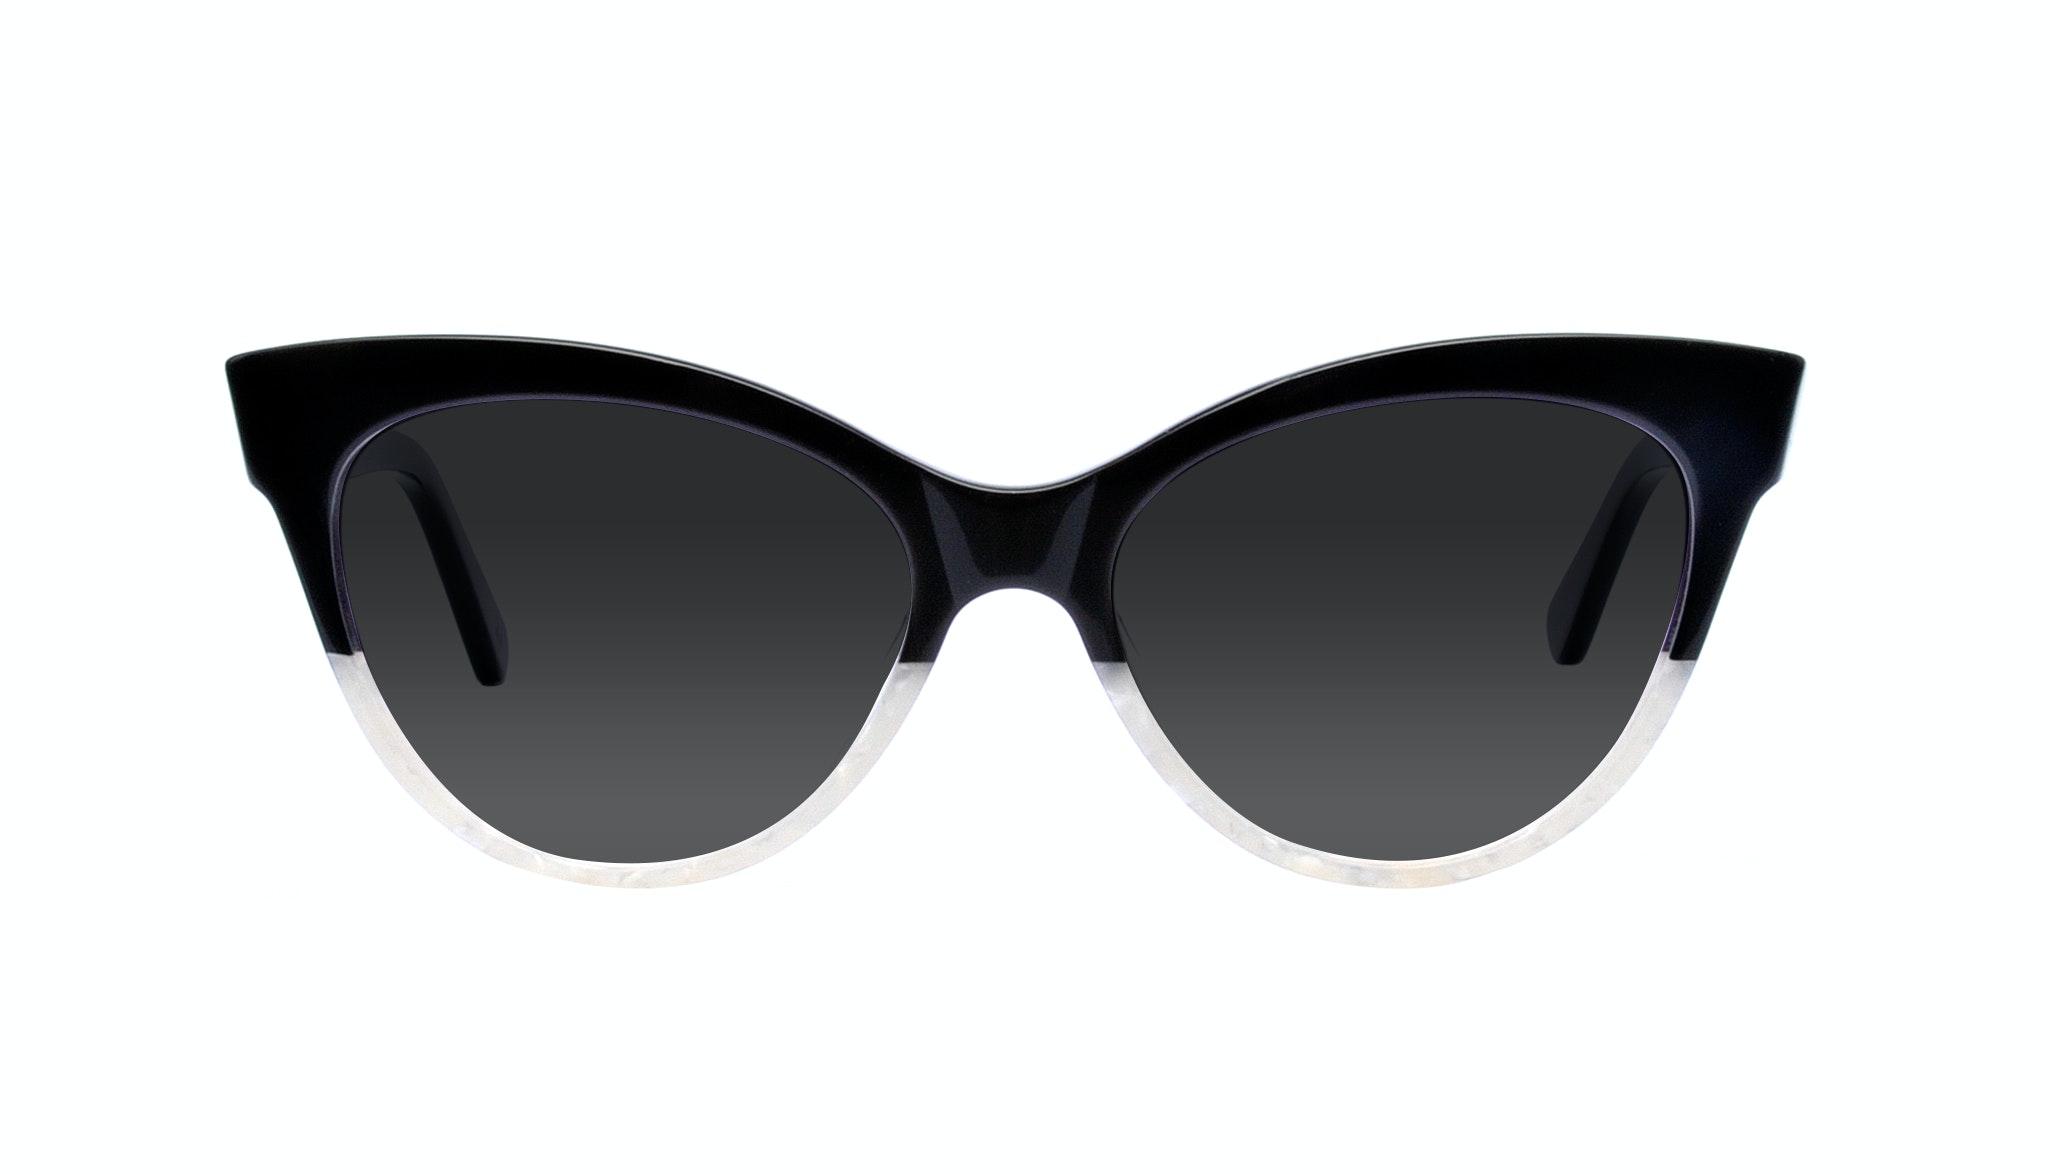 Affordable Fashion Glasses Cat Eye Daring Cateye Sunglasses Women SkunkBoy Panda Pearl Front